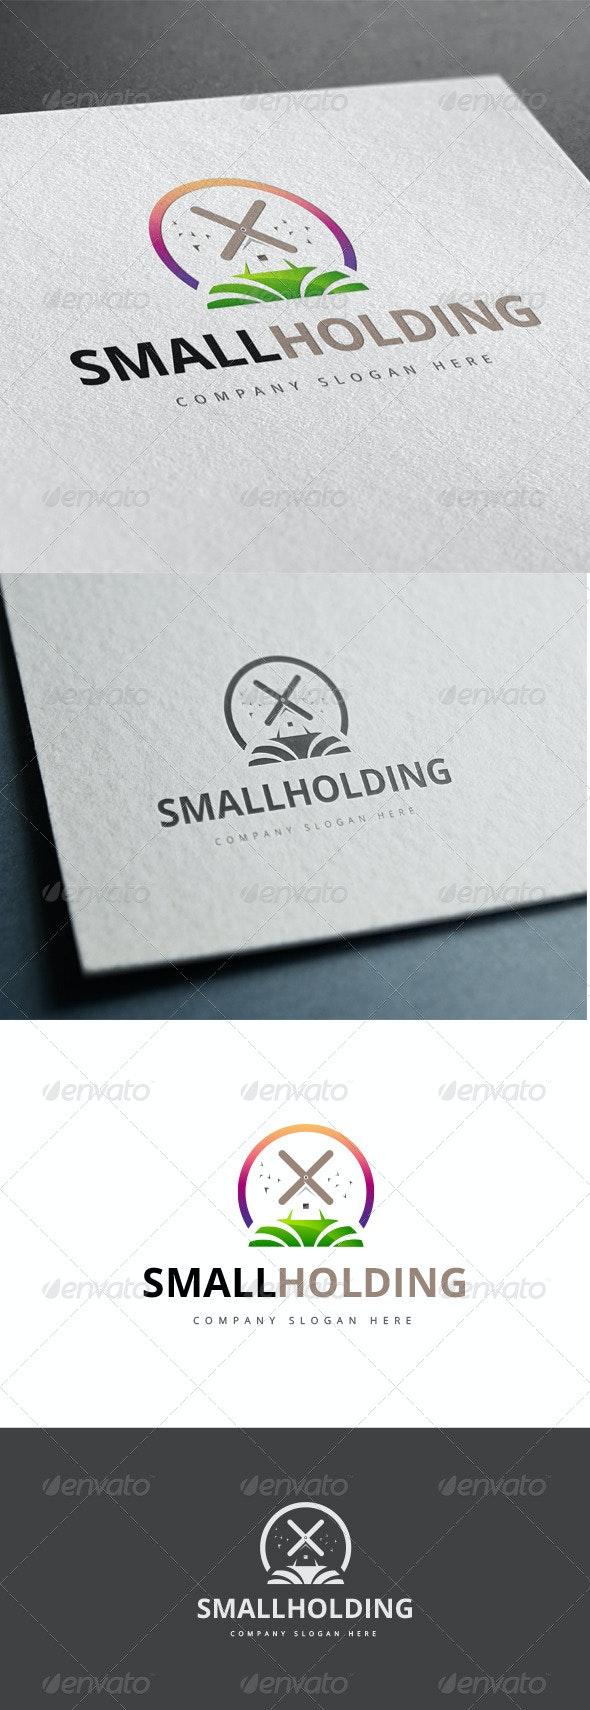 Smallholding Logo - Logo Templates